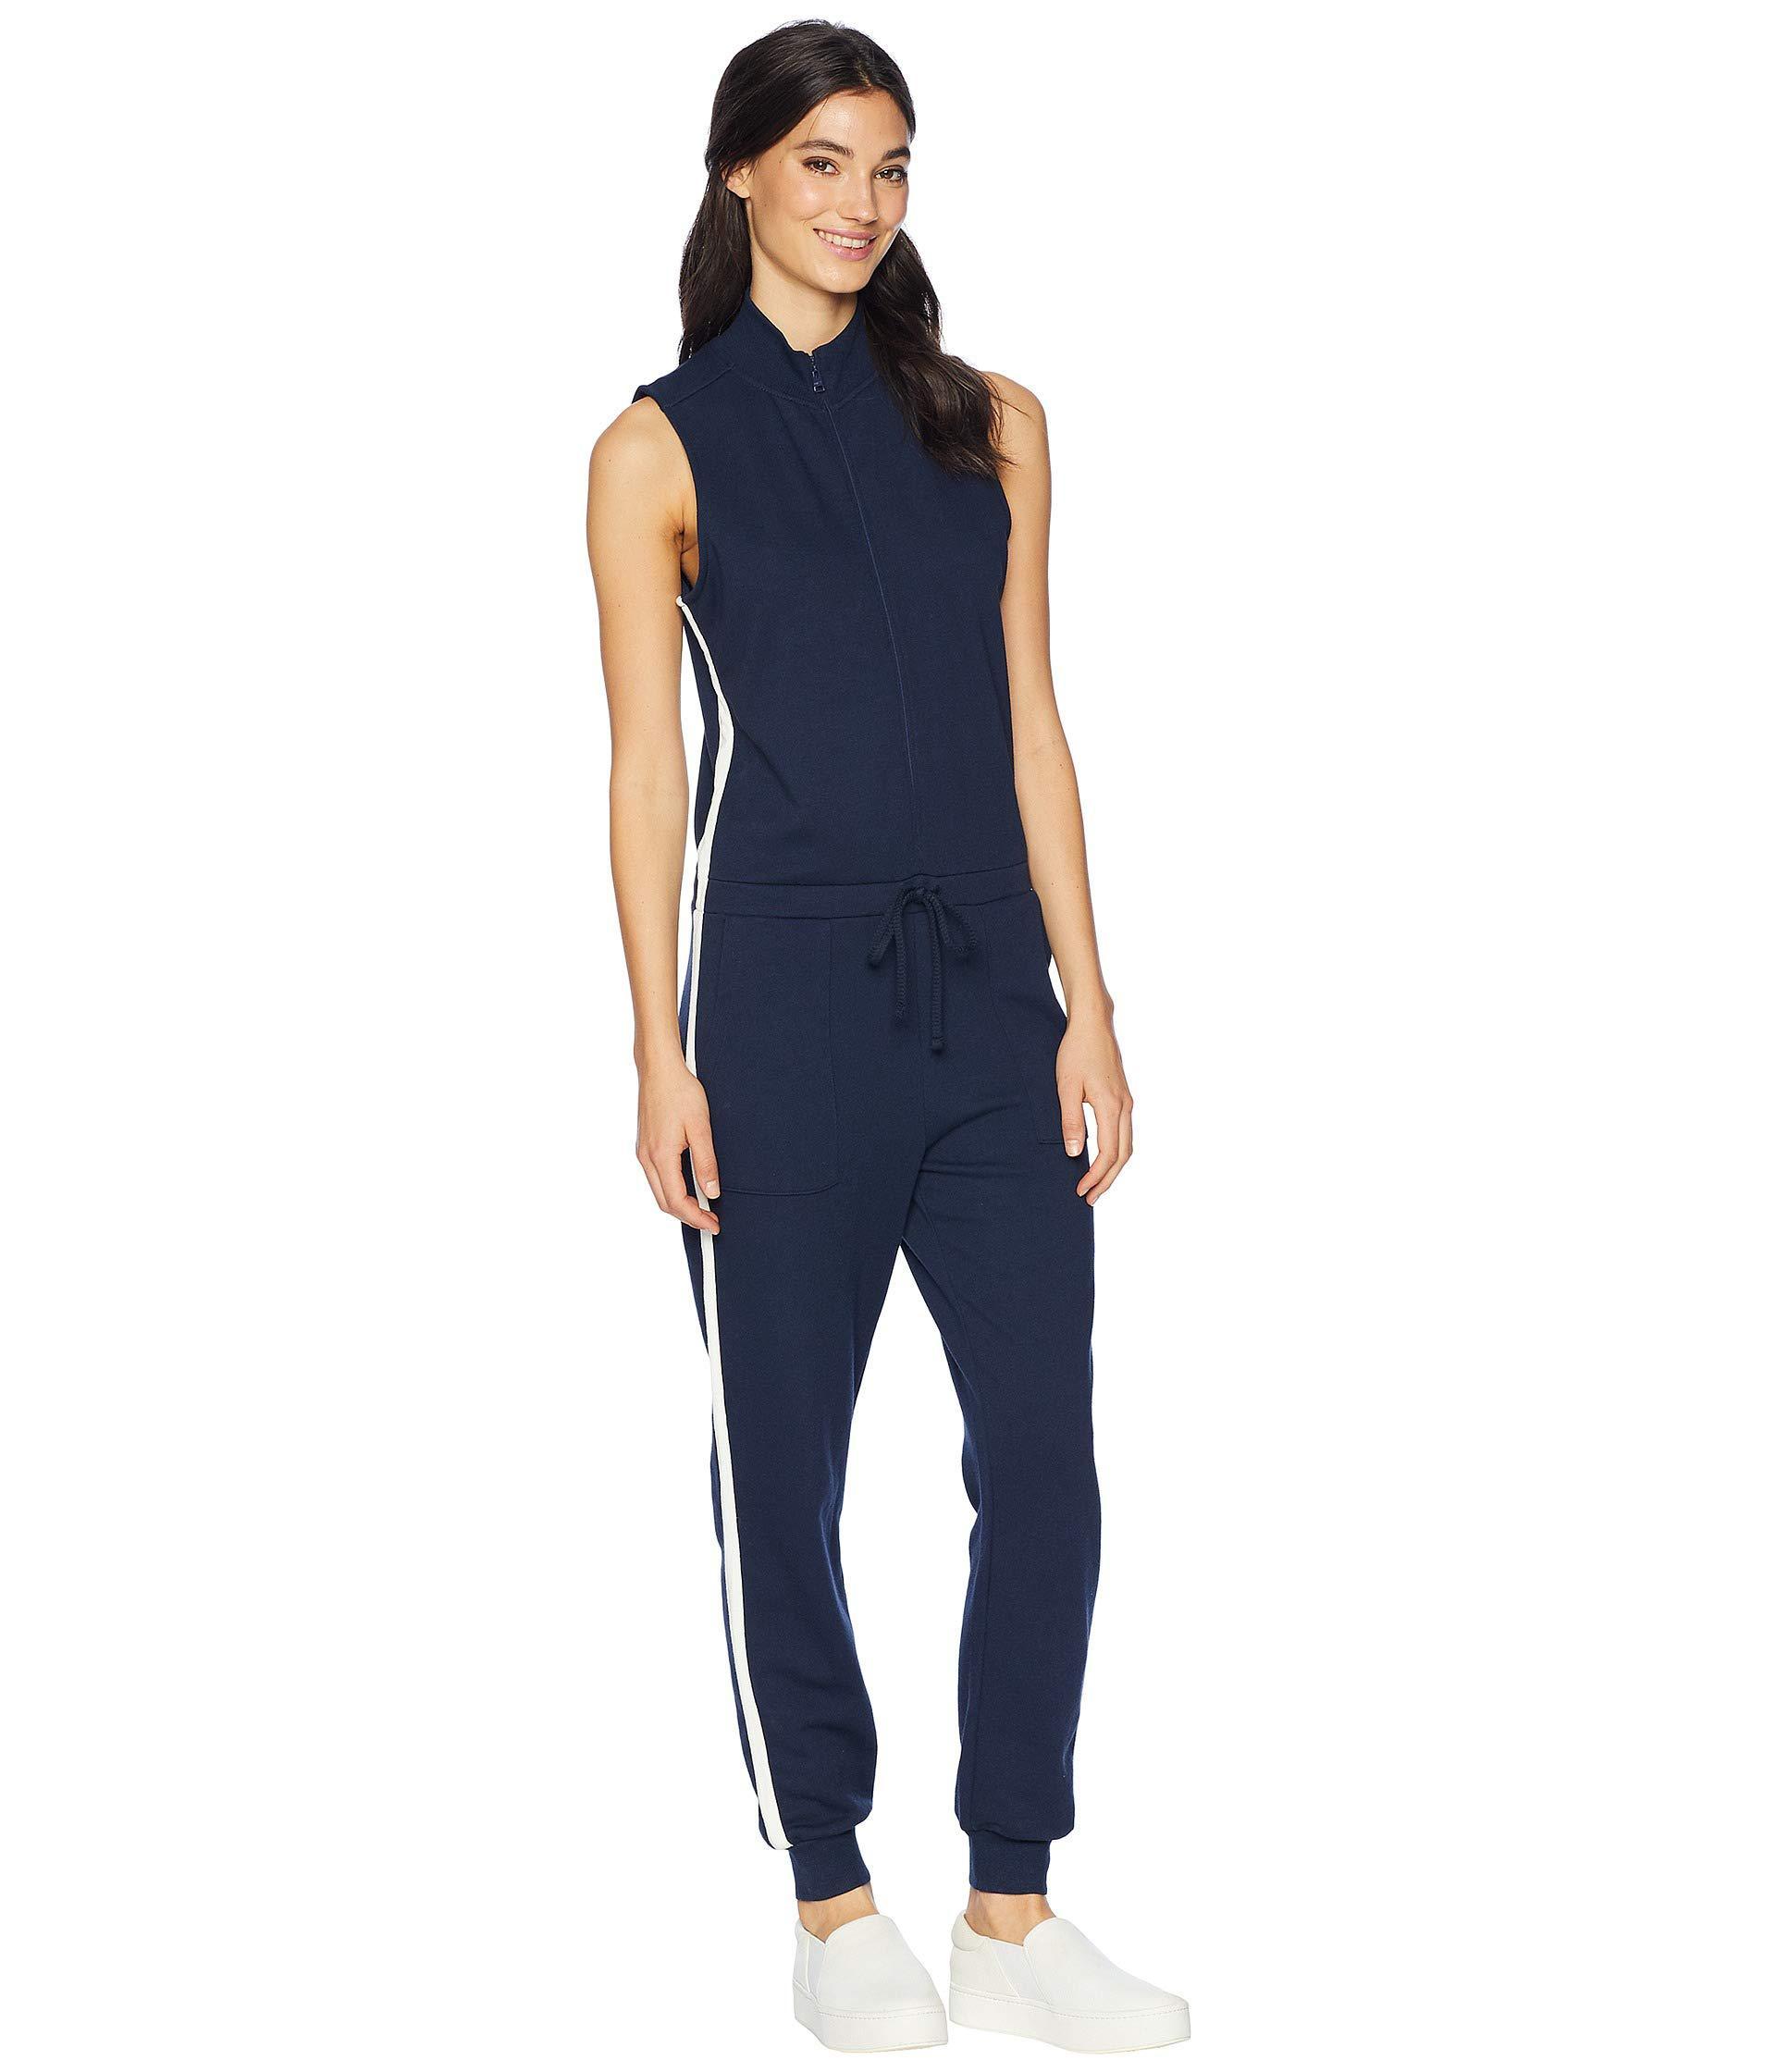 d7792819bb31 Juicy Couture - Blue Knit Terry Color Block Stripe Jumpsuit - Lyst. View  fullscreen